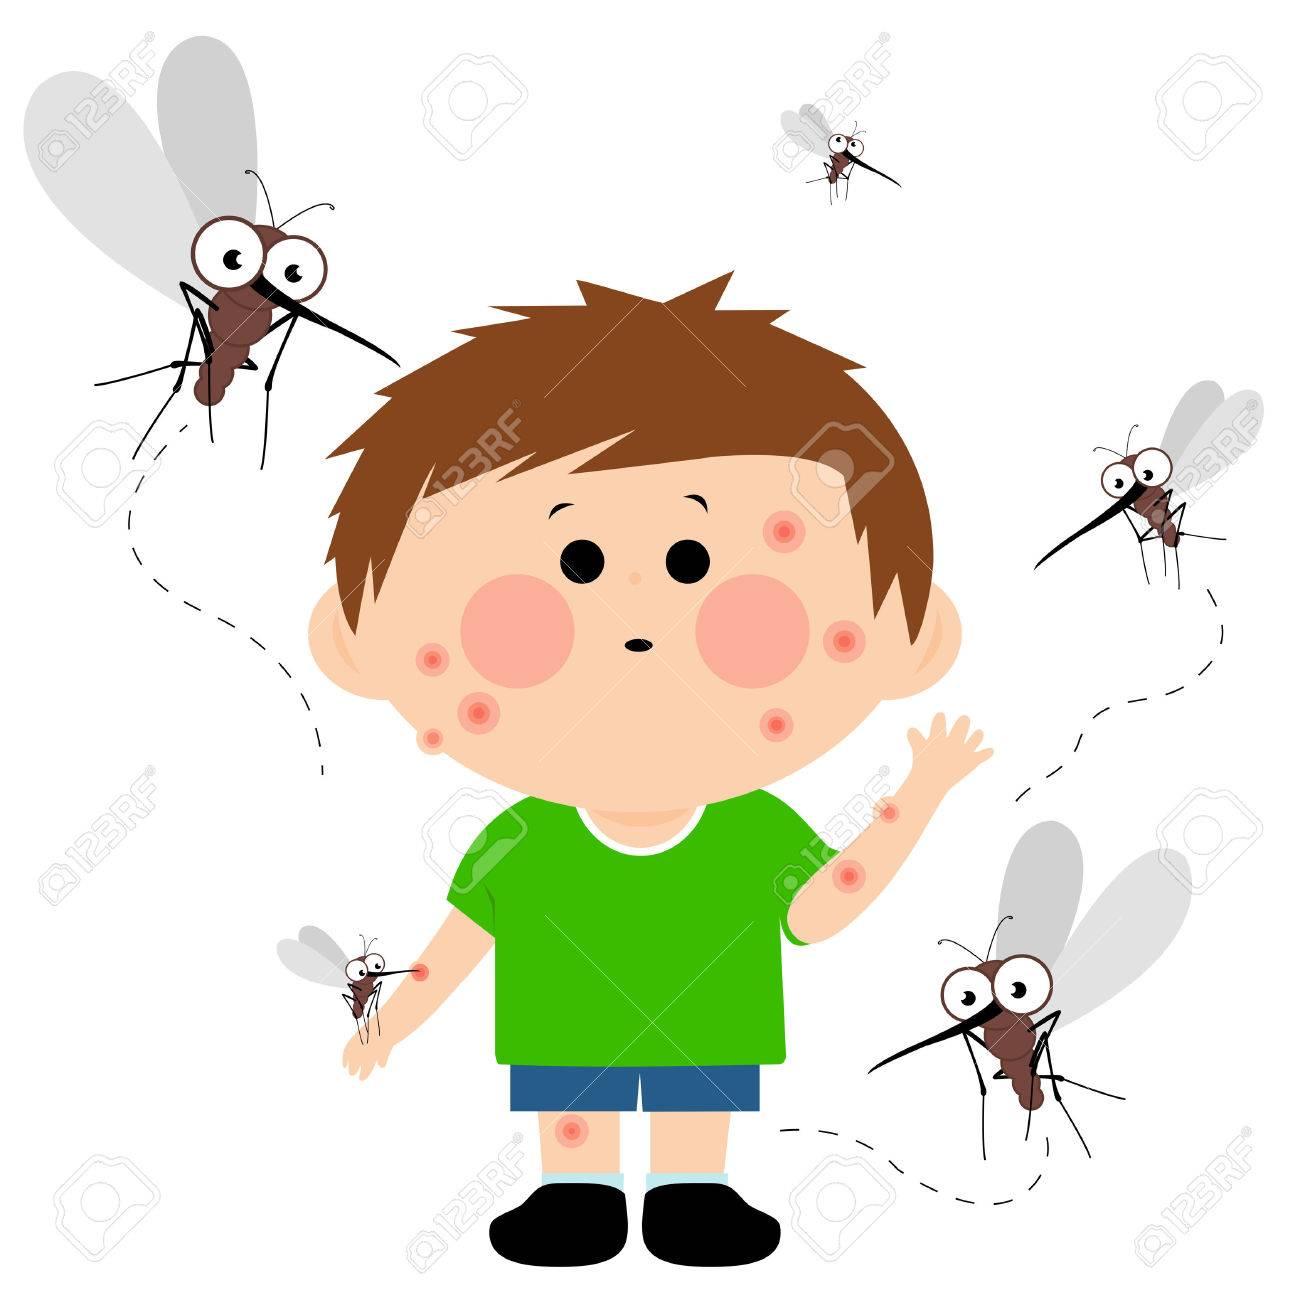 Boy bitten by mosquitoes - 54273223